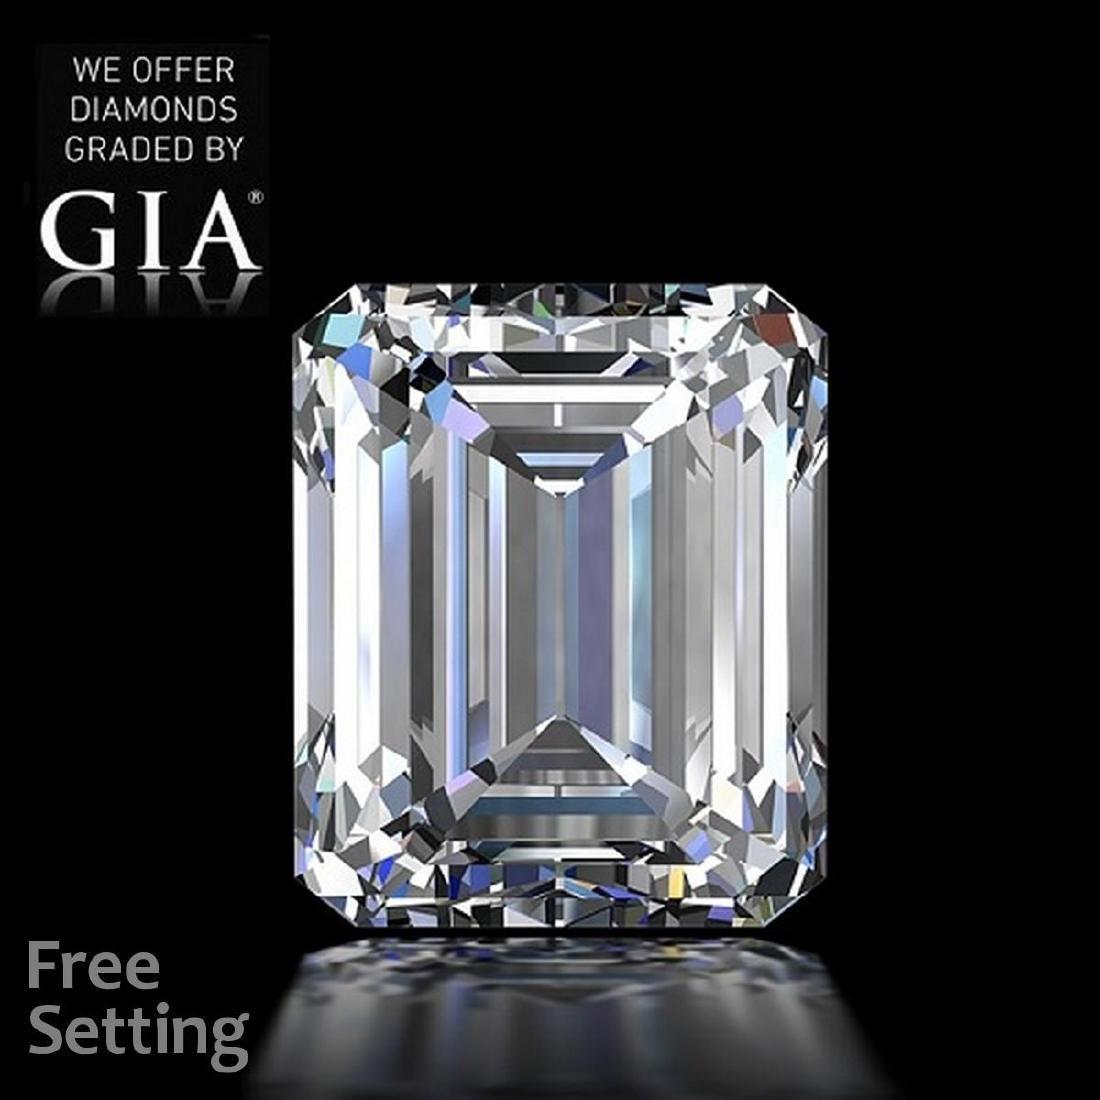 5.01 ct, Color G/VVS1, Emerald cut Diamond